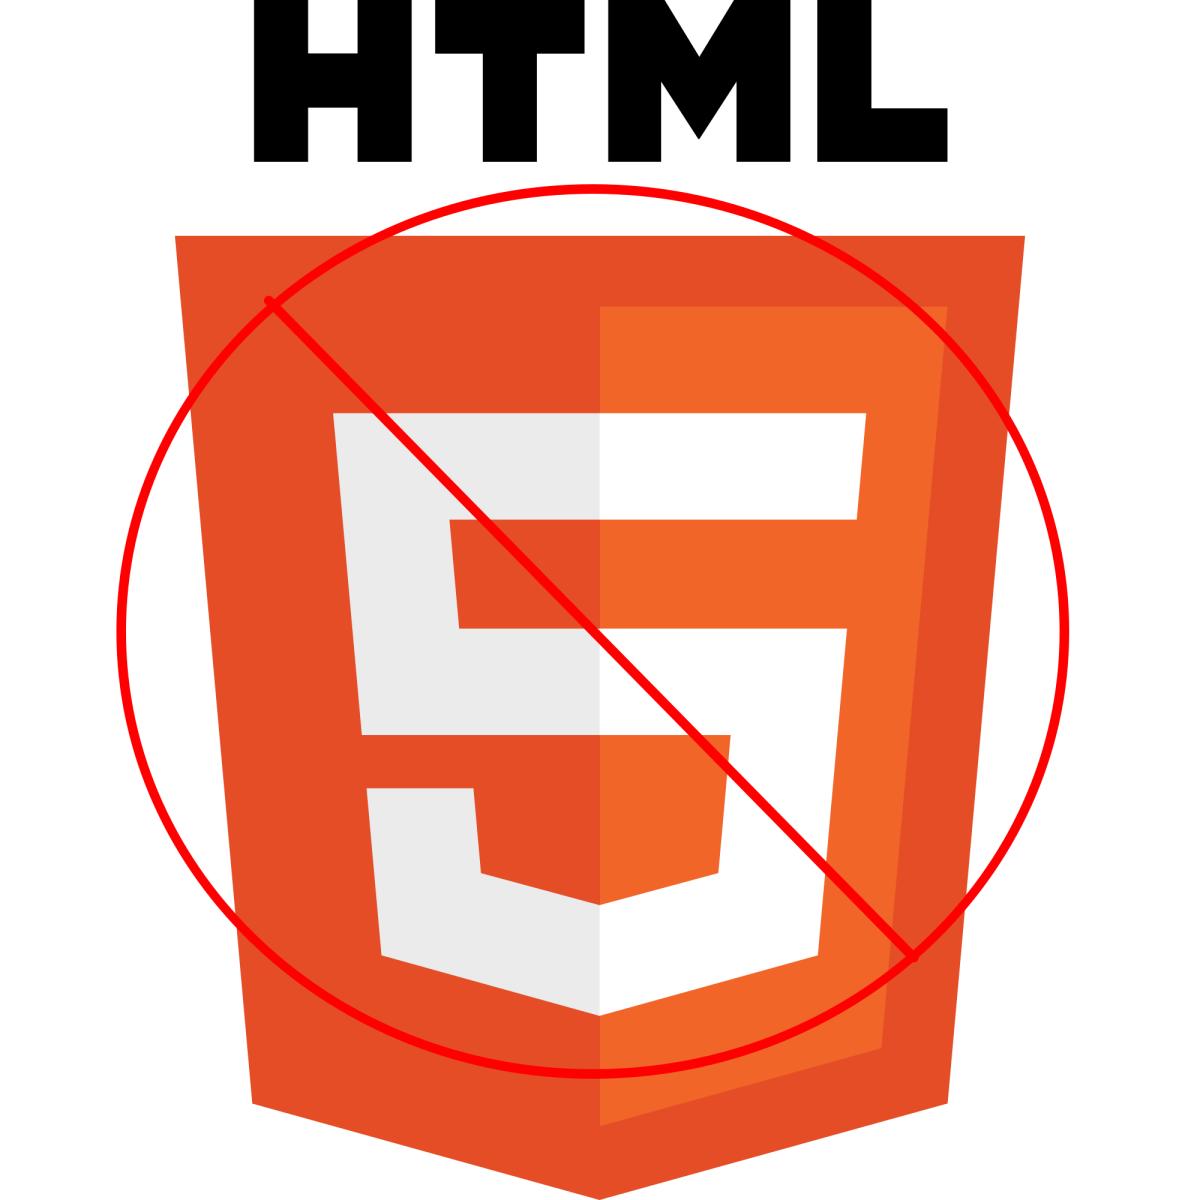 Yet another major cross-platform project shunsHTML5